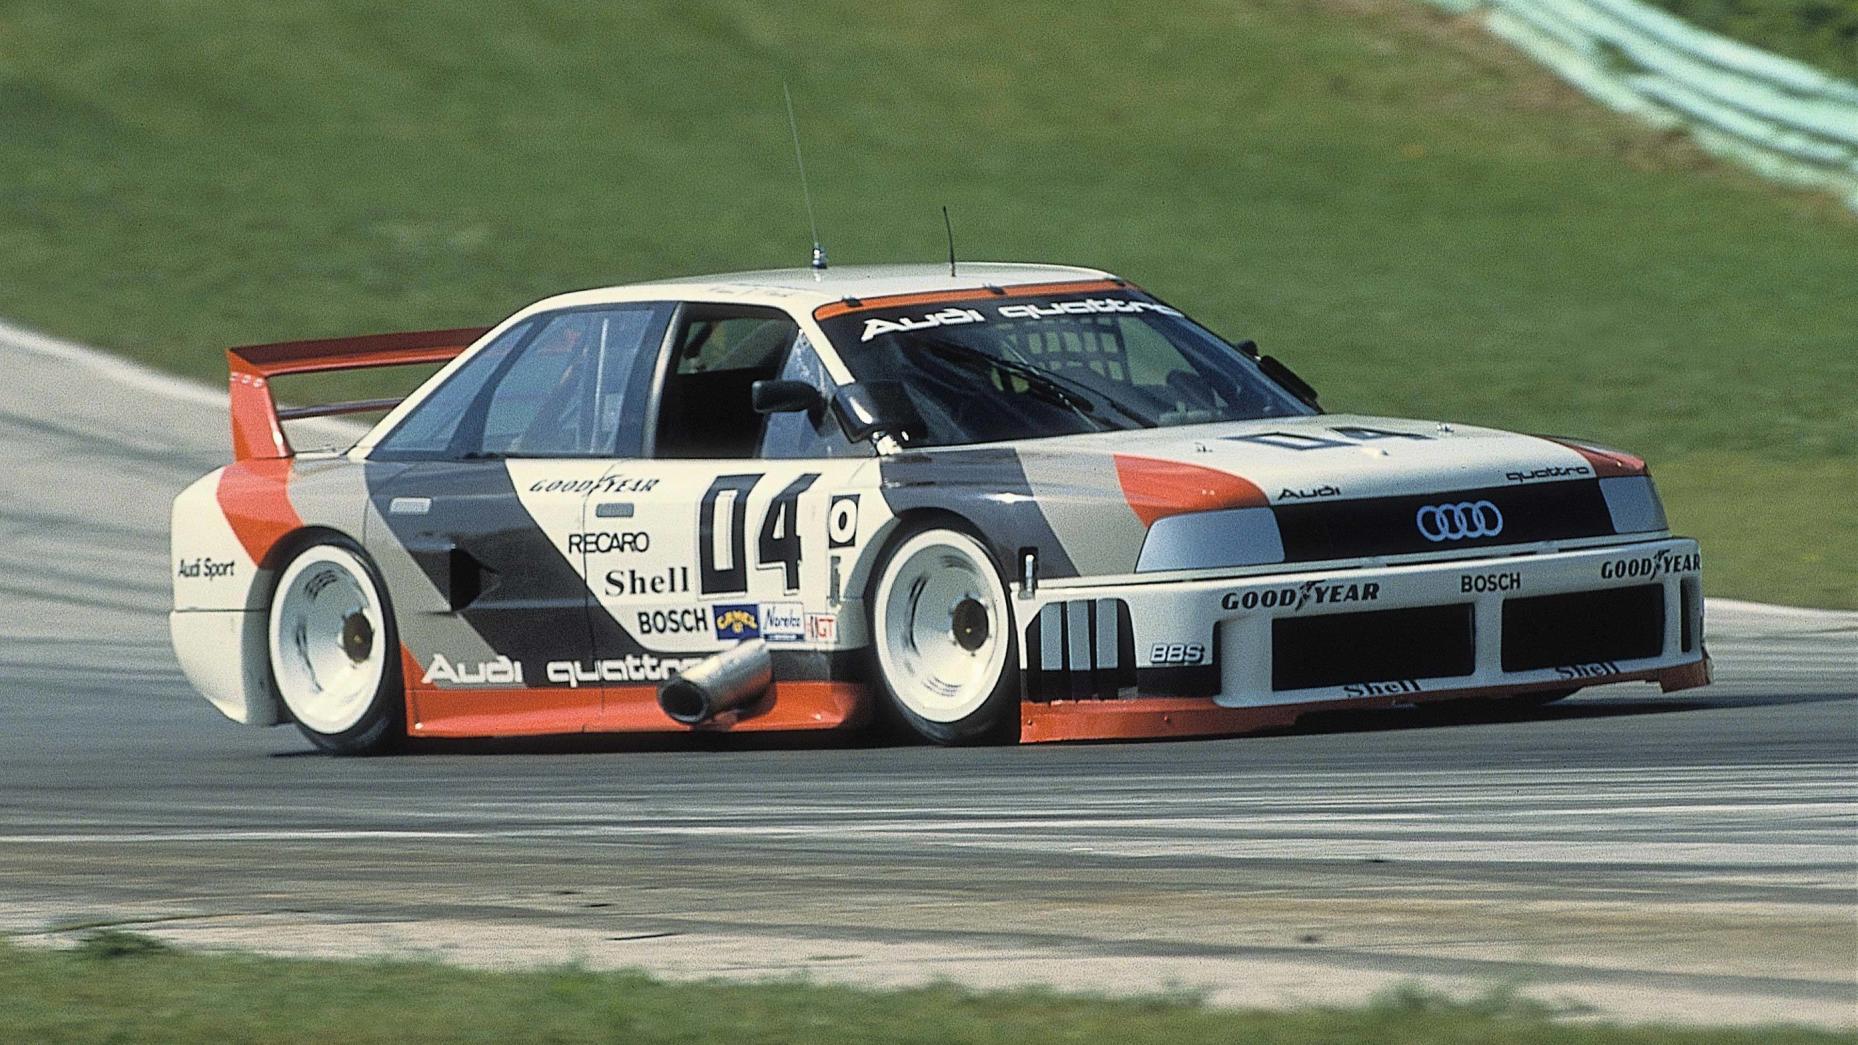 Najluđi Touring automobili svih vremena - Audi 90 Quattro IMSA